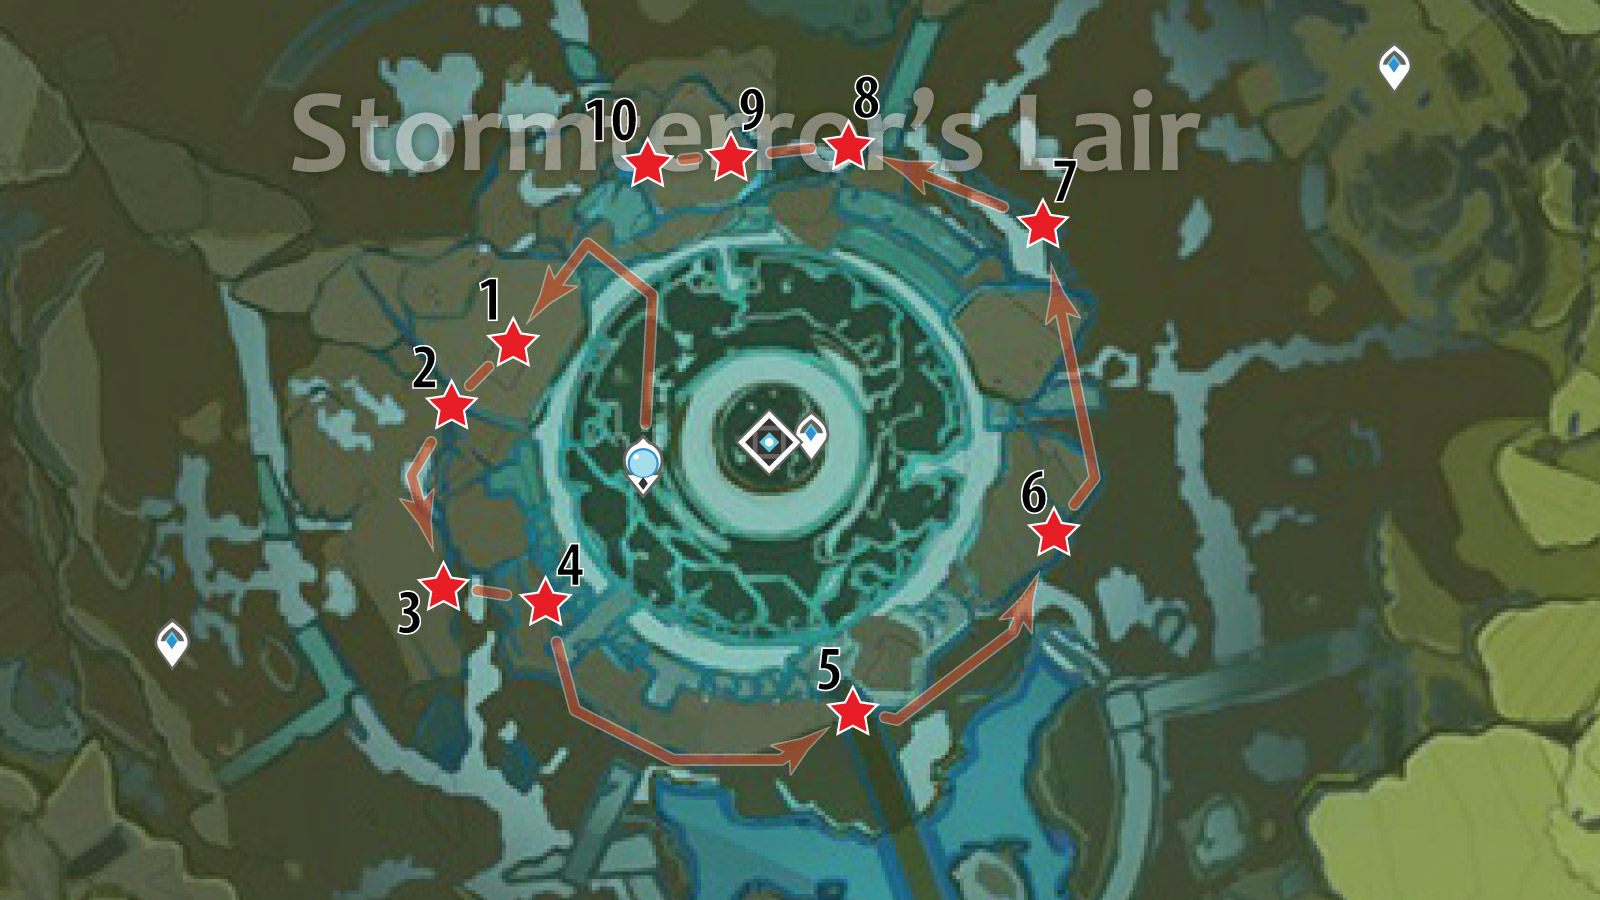 Stormterror's Lair Crystal Chunk Farming Route